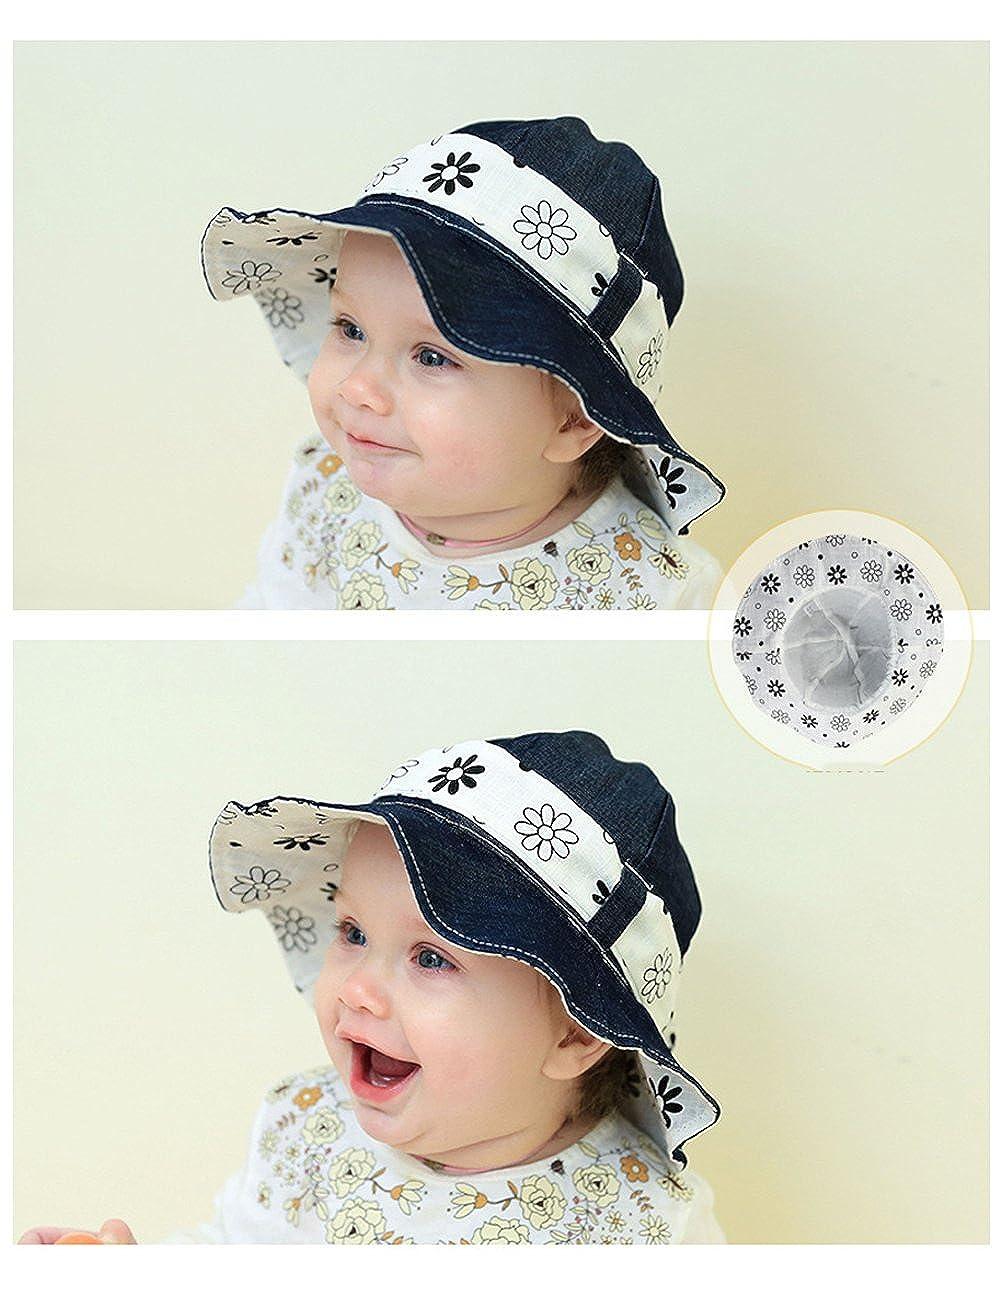 b6131693ed209 Amazon.com  Baby Kids Girls Boys Toddler Fisherman Bucket Hat Pattern Wide  Brim Outdoor Cap Sun Hat by Viva Fancy  Clothing